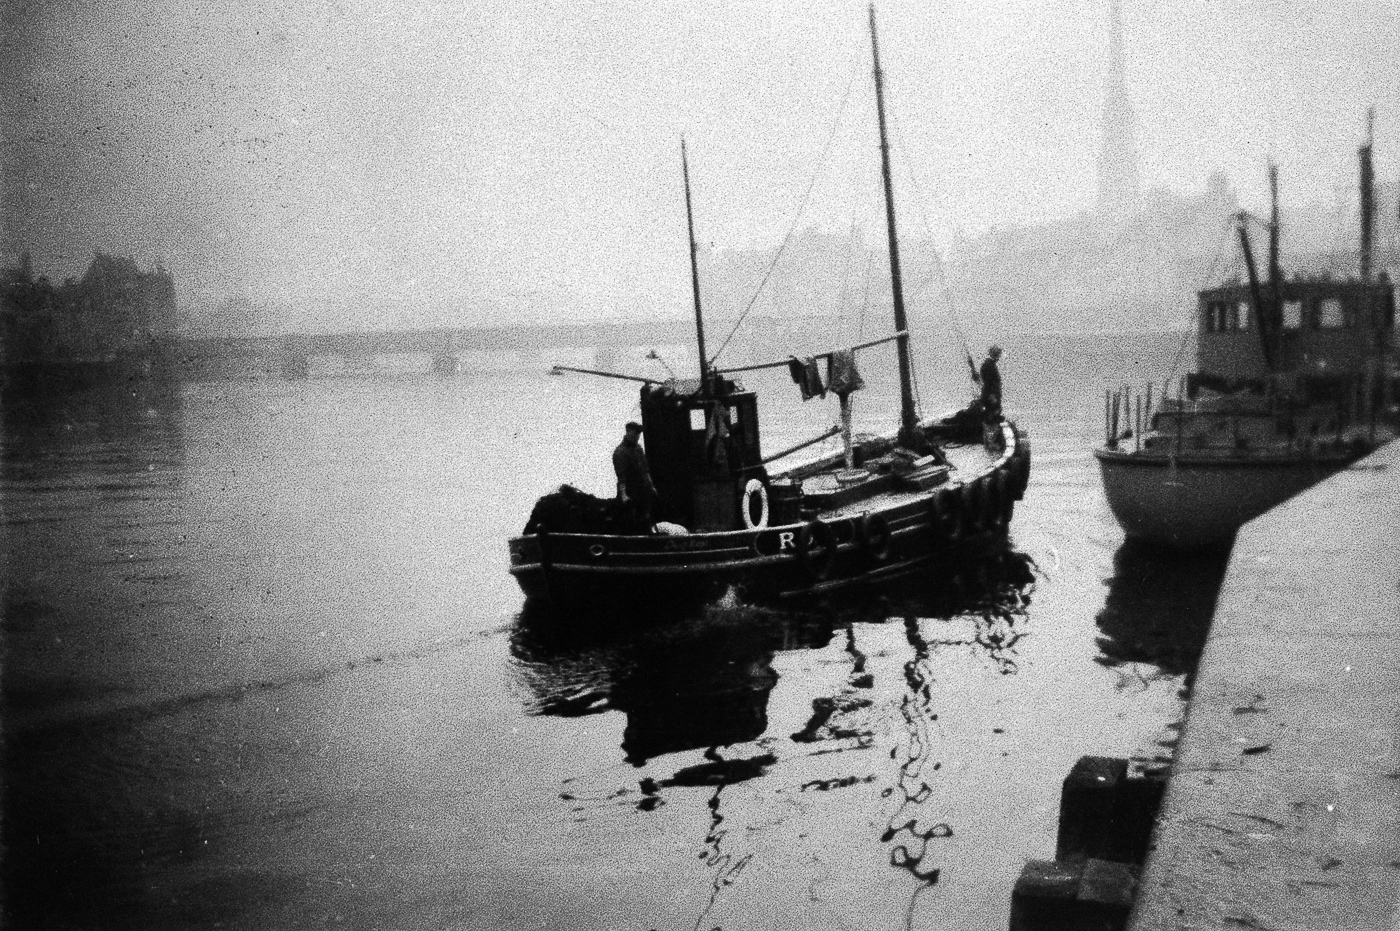 'Dewy Rose', RO5, arriving at Ayr harbour, 1952.